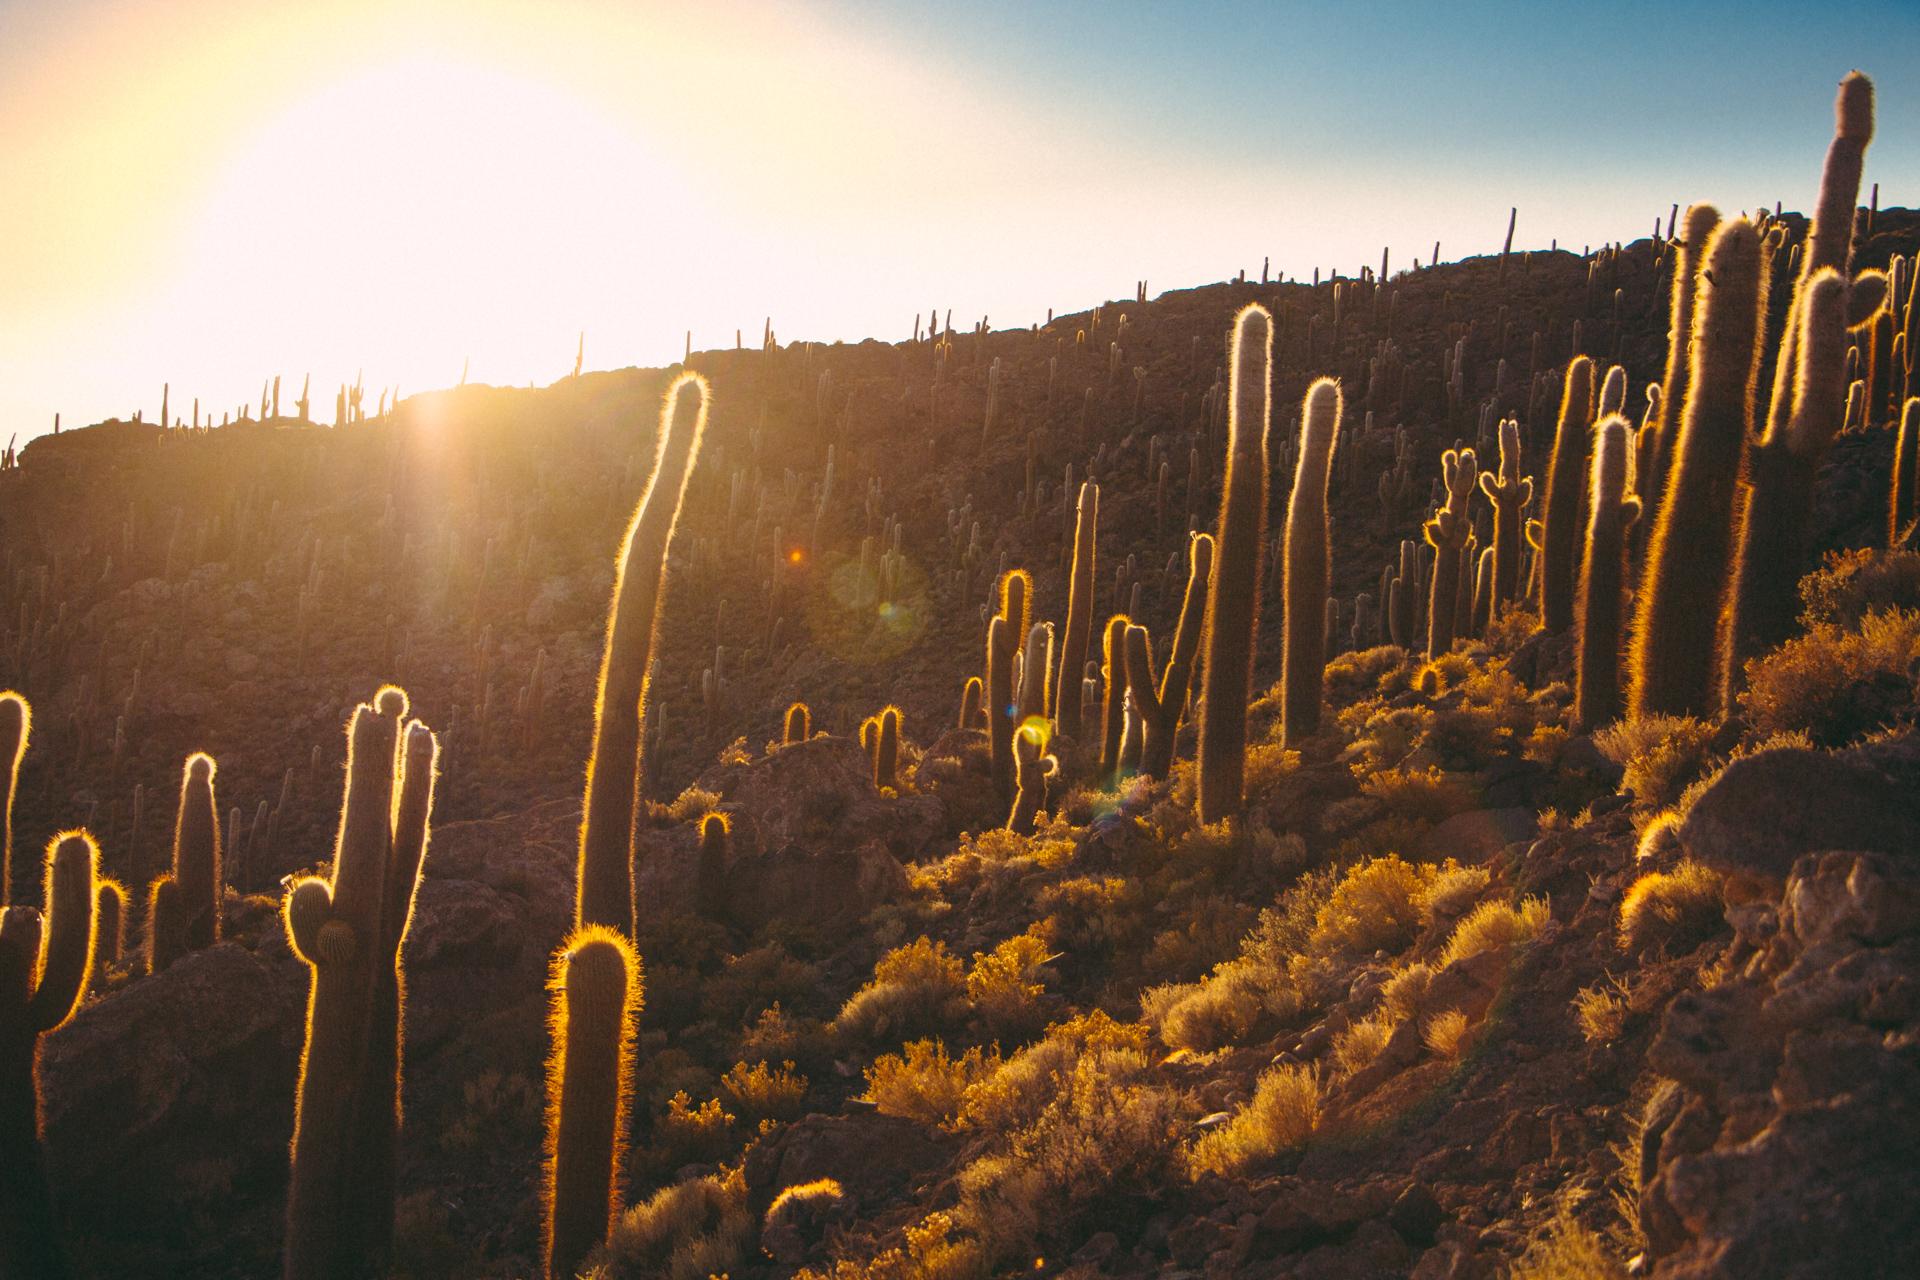 Salt Flat Cactus Island Sunrise